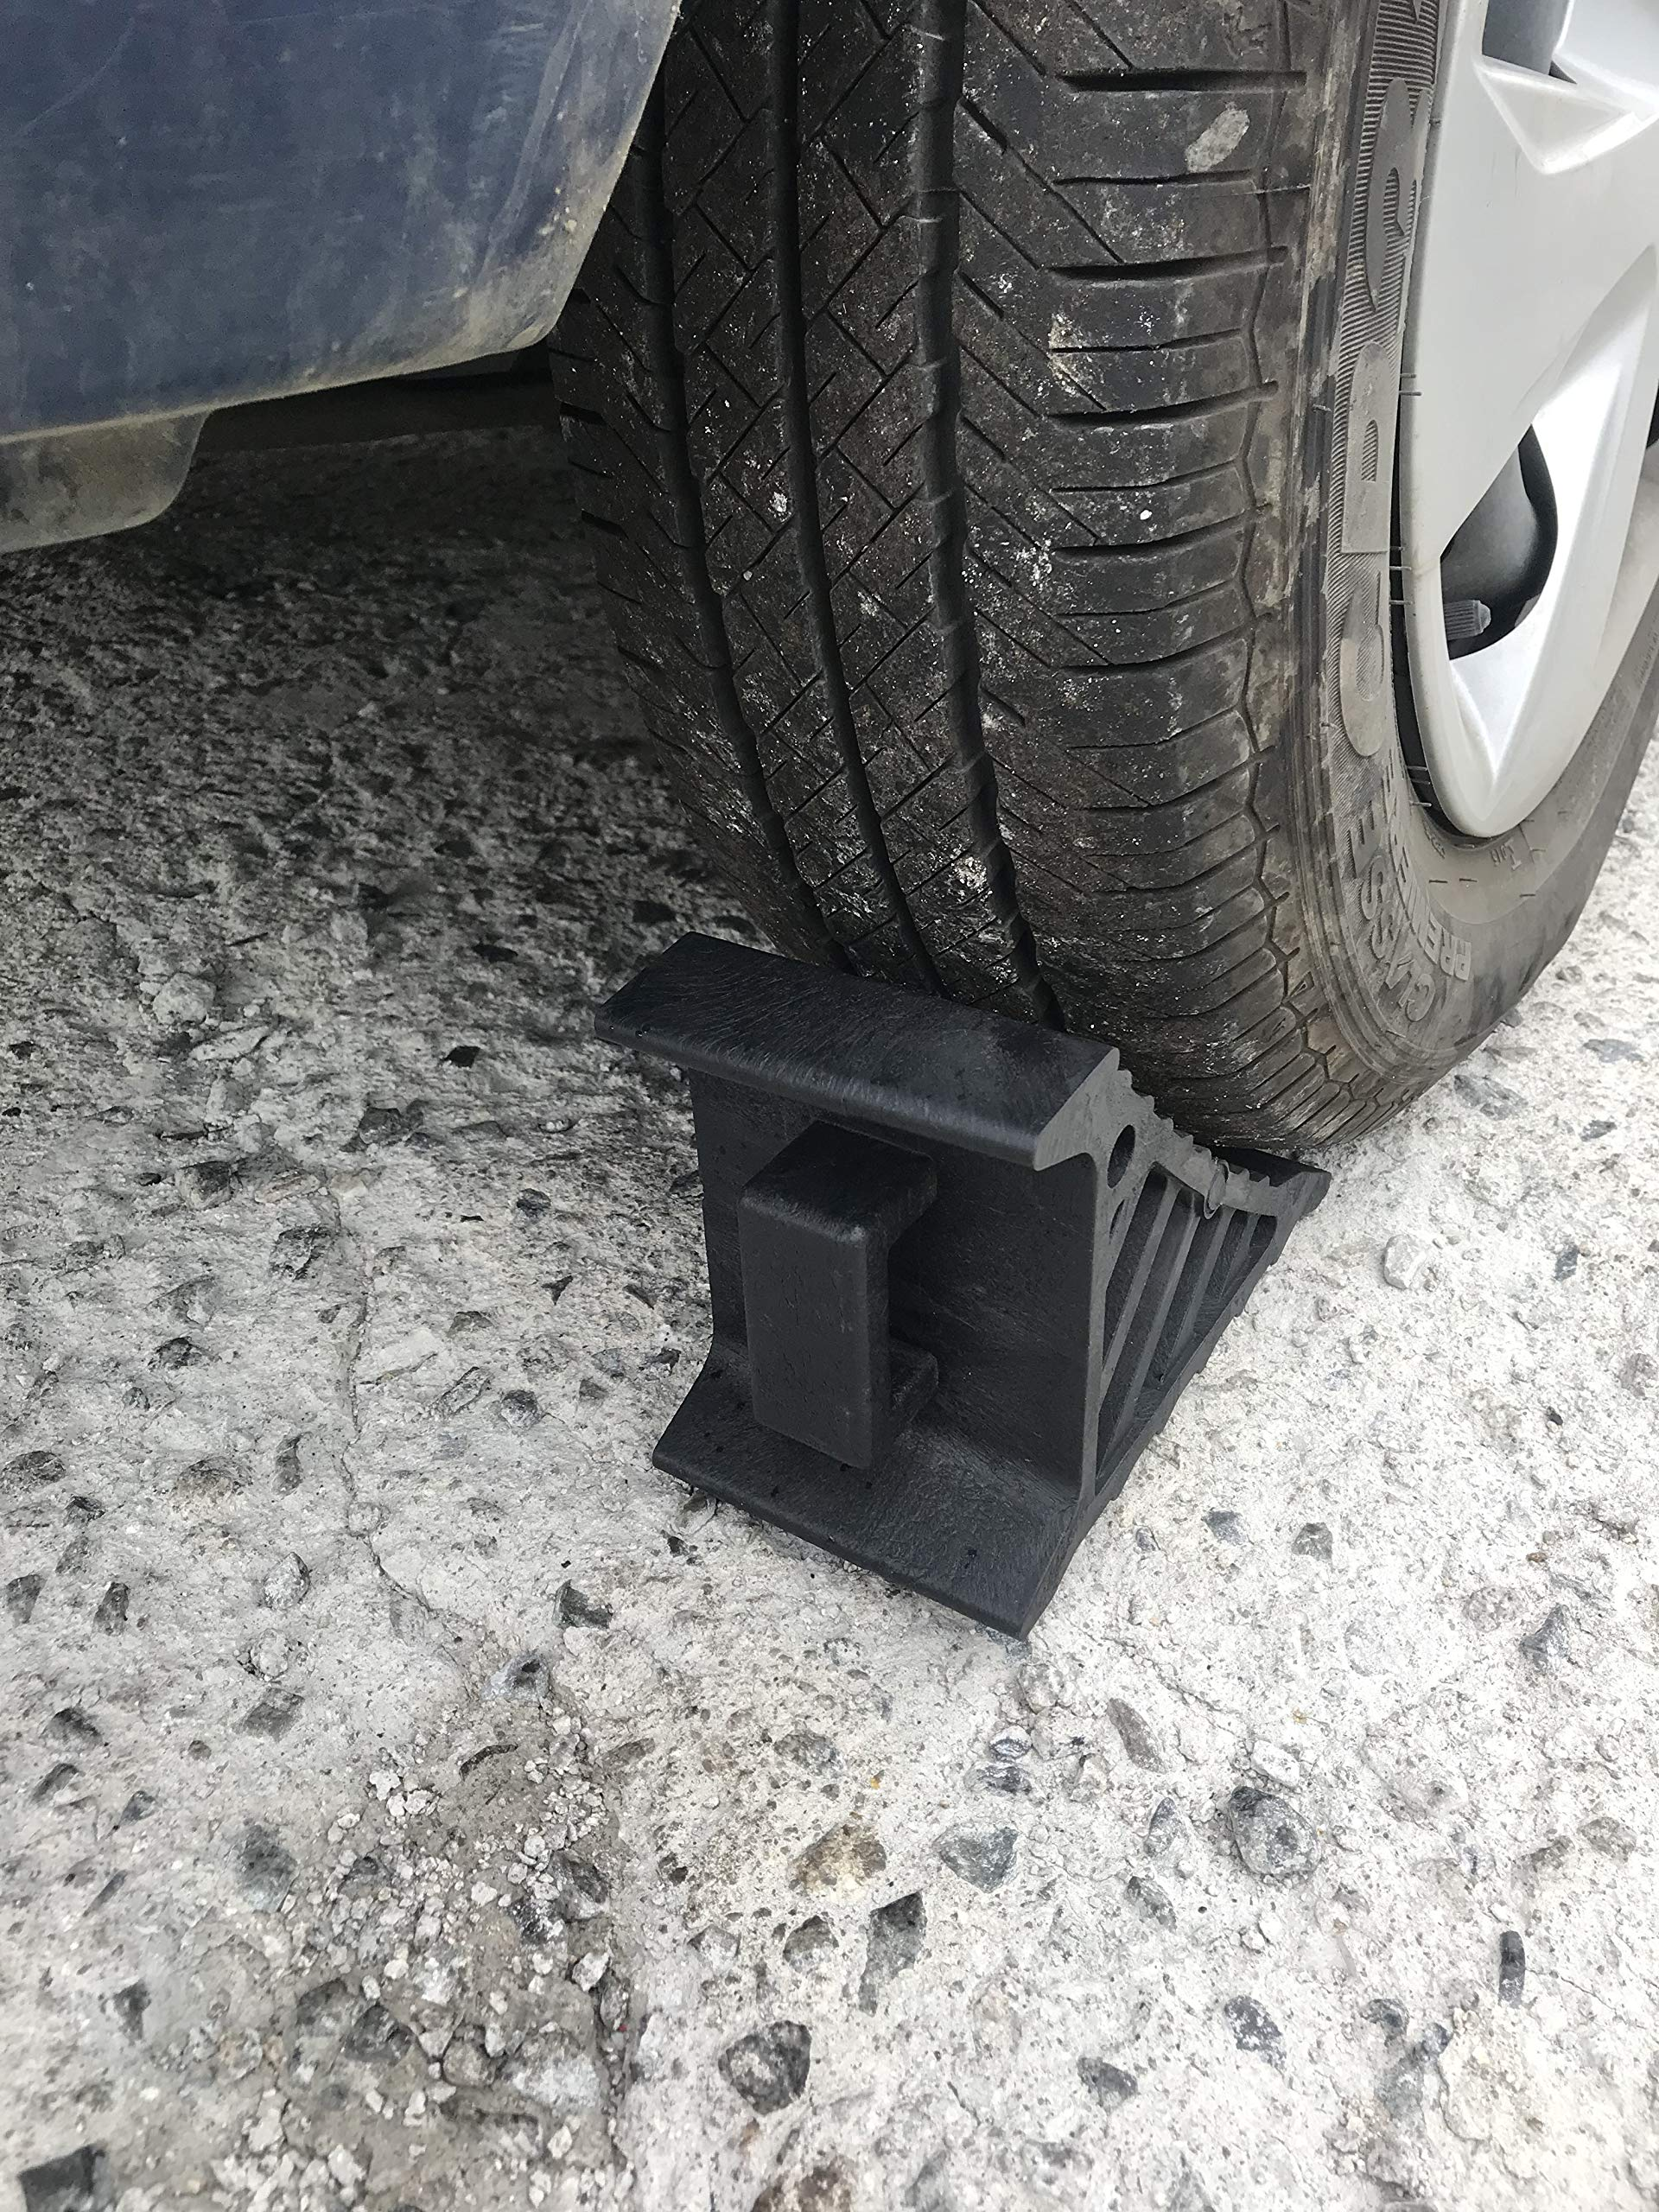 DK Safety, 306A Heavy Duty Wheel Chocks with Handle, Wheel Immobilizer, Trailer Chocks, Car Chocks, Truck Chocks, Wheel Chocks, Keep Your Vehicle in Place - Pack of 2 (Medium)